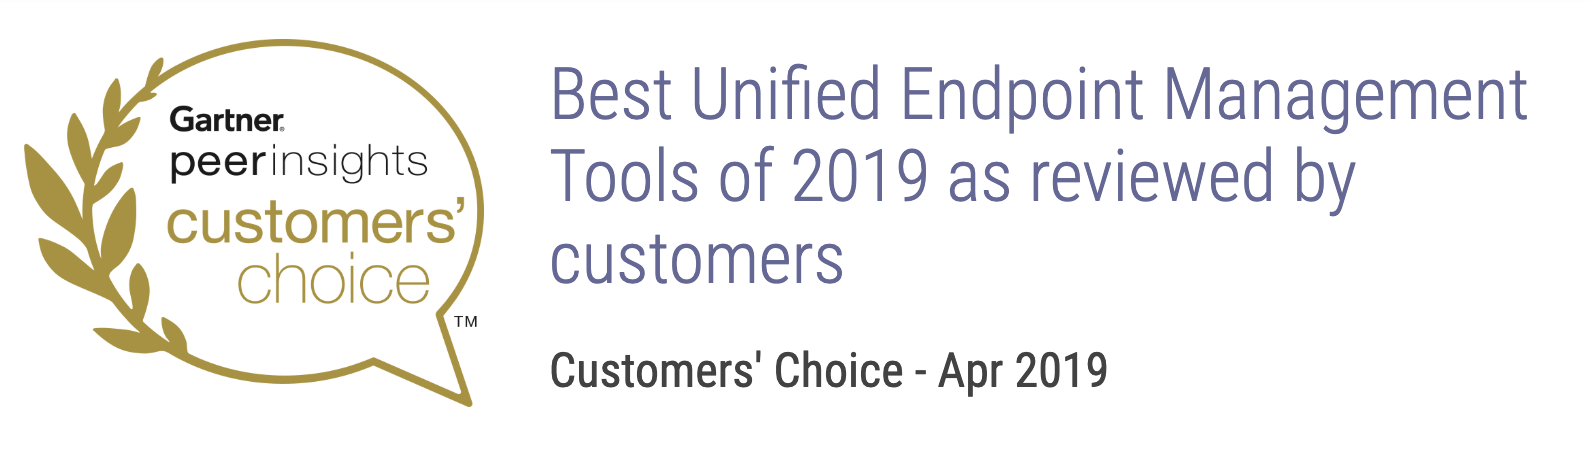 Banner mejores herramientas UEM 2019